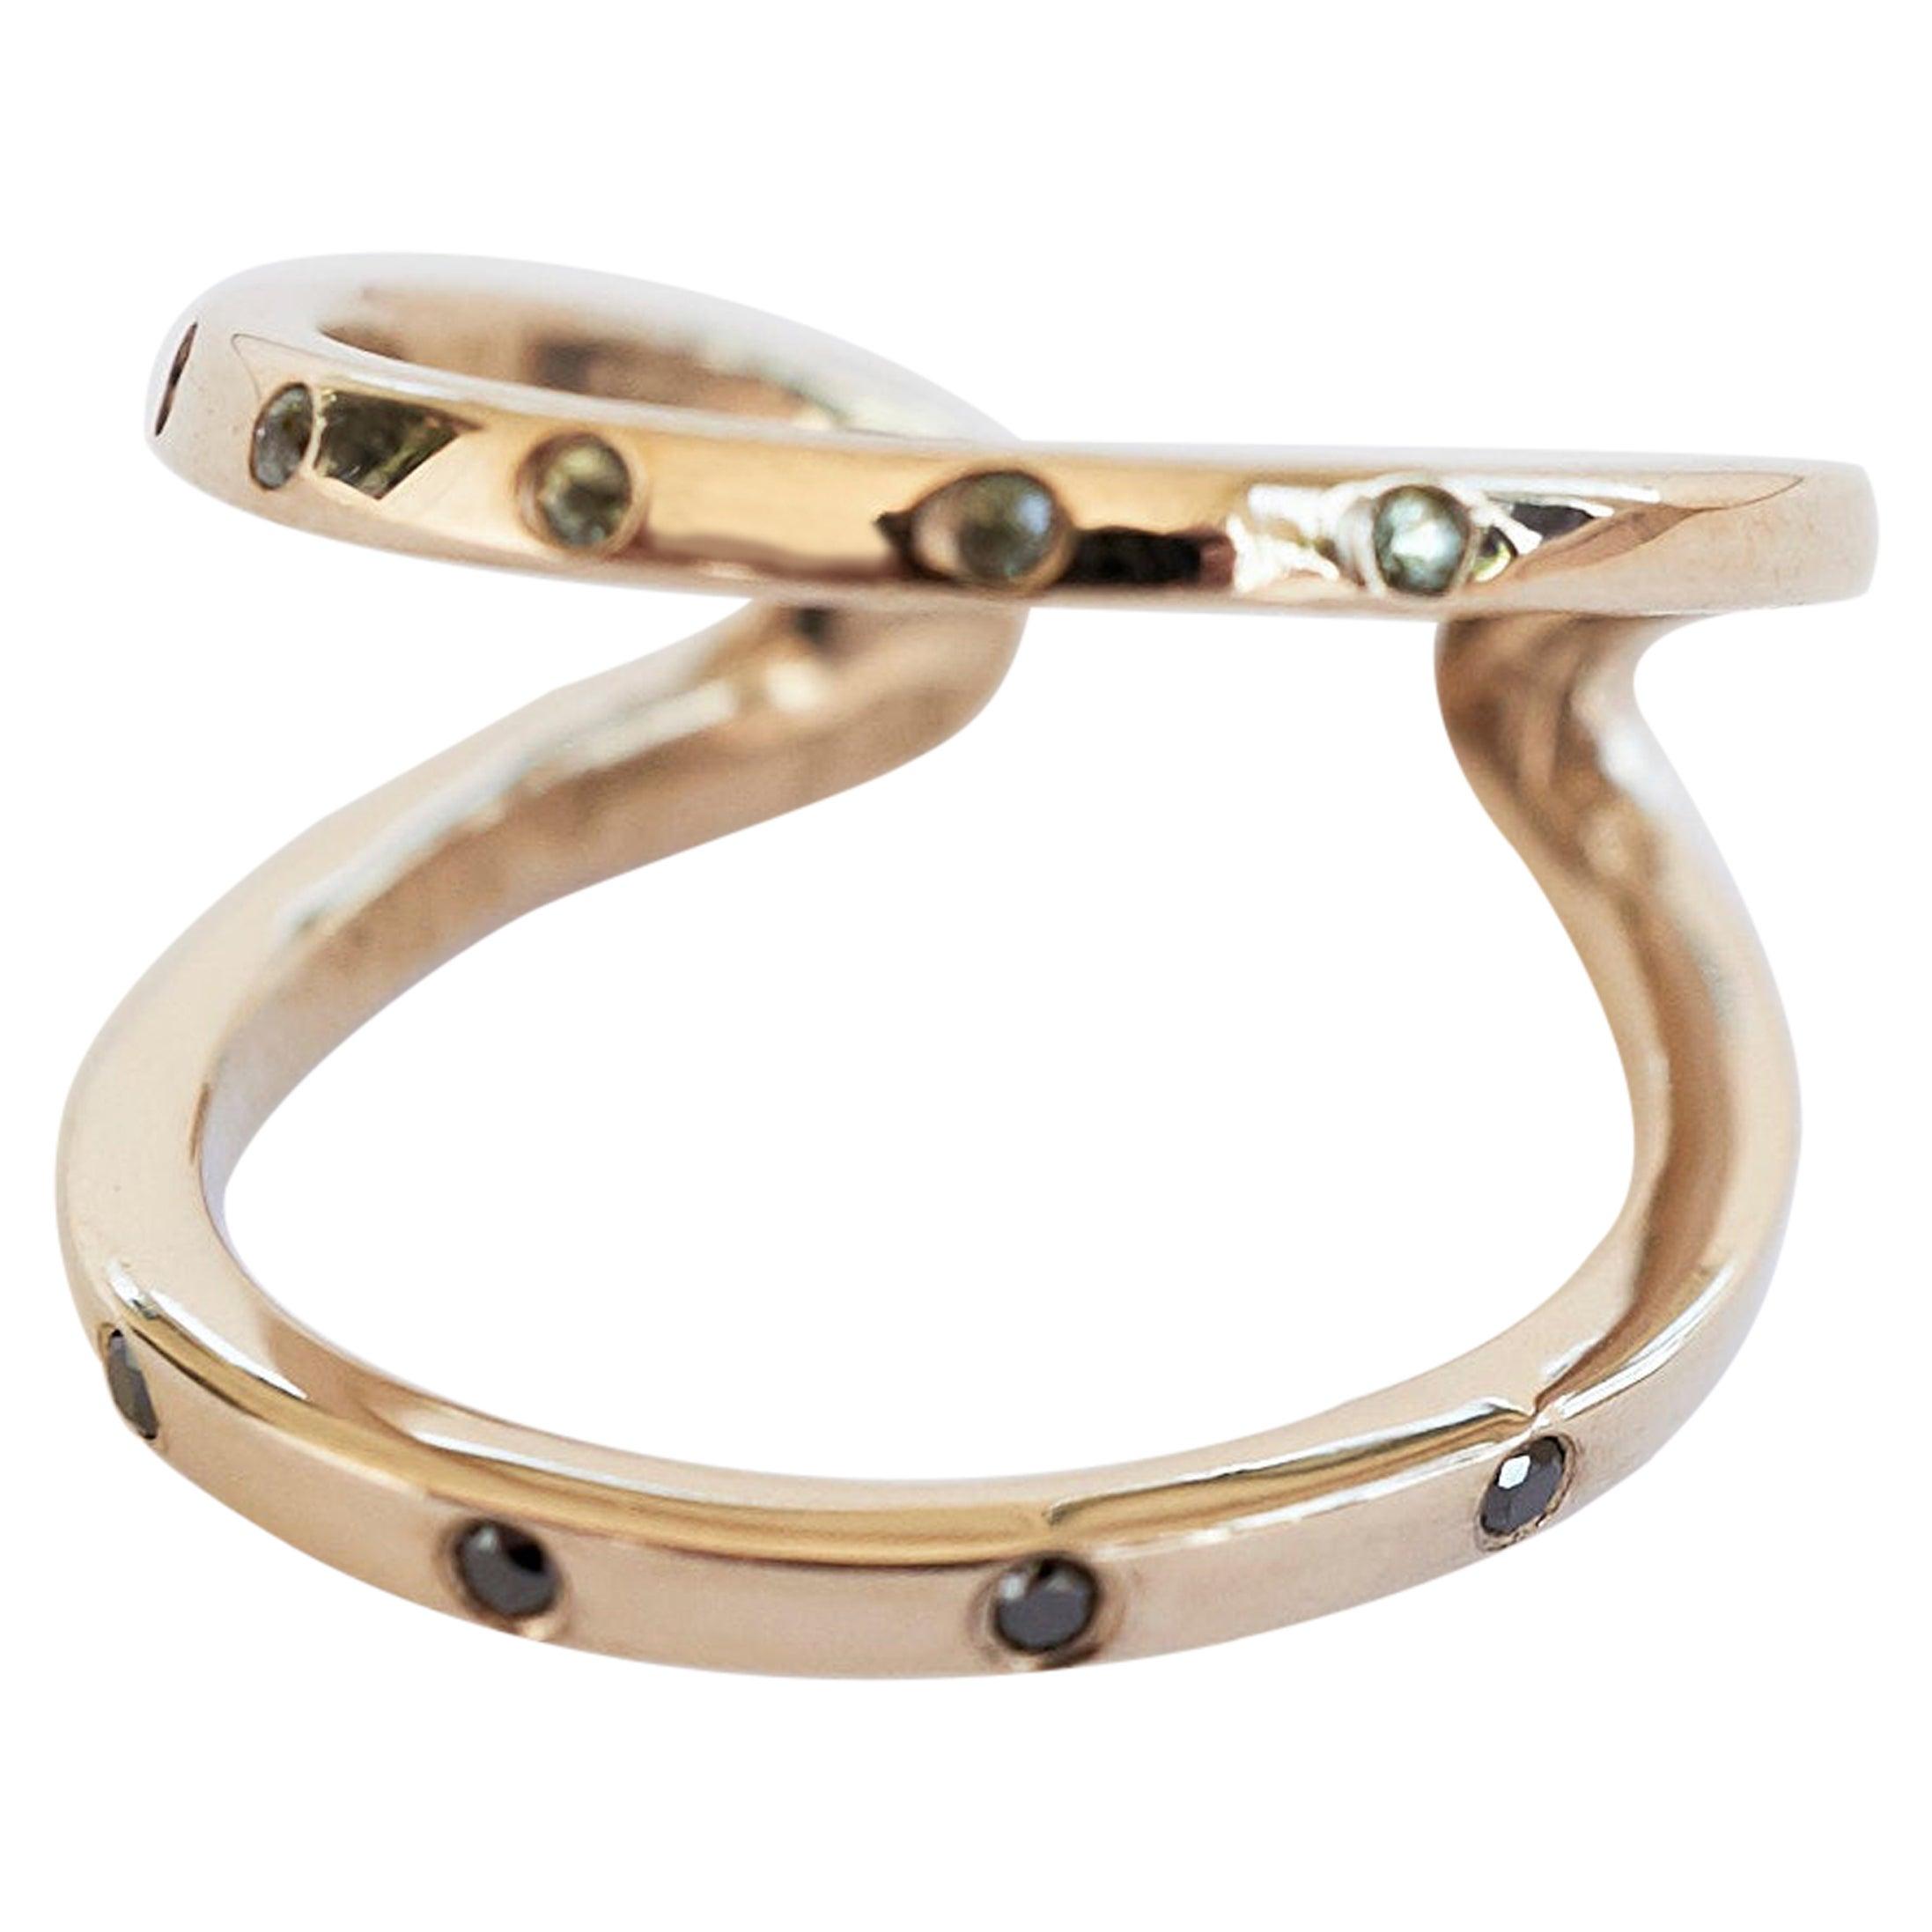 Black Diamond Green Sapphire Gold Ring Cocktail Ring Onesie J Dauphin